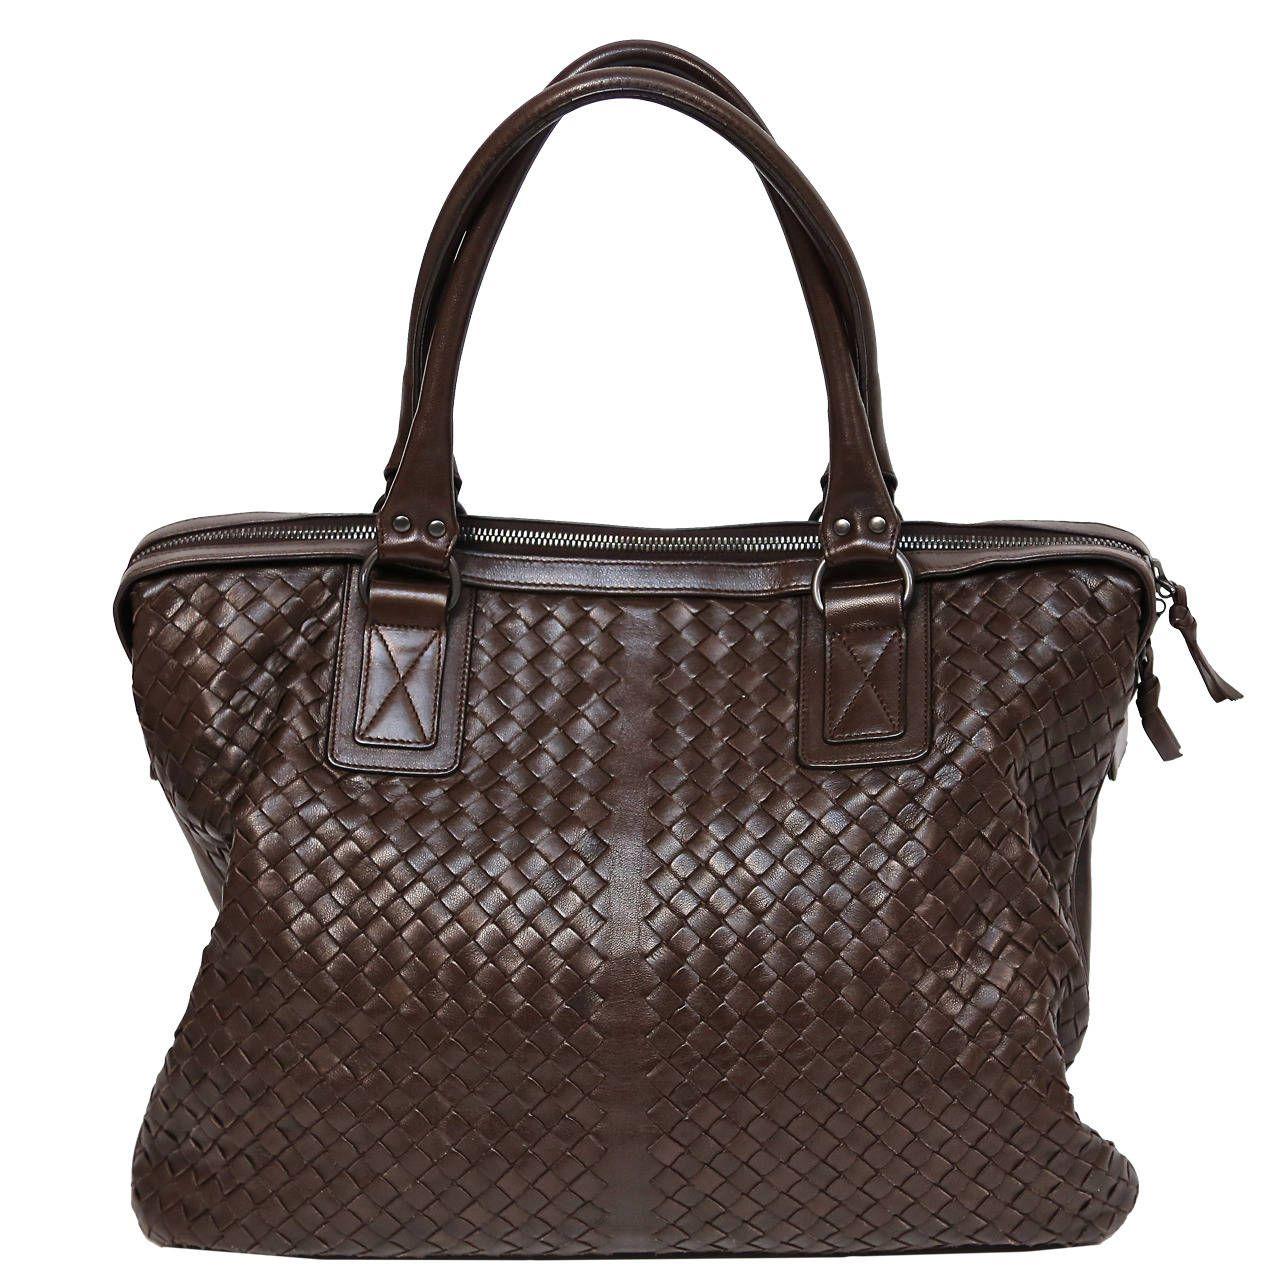 22fdfee12e006 BOTTEGA VENETA oversized brown intrecciato woven leather tote bag | From a  collection of rare vintage